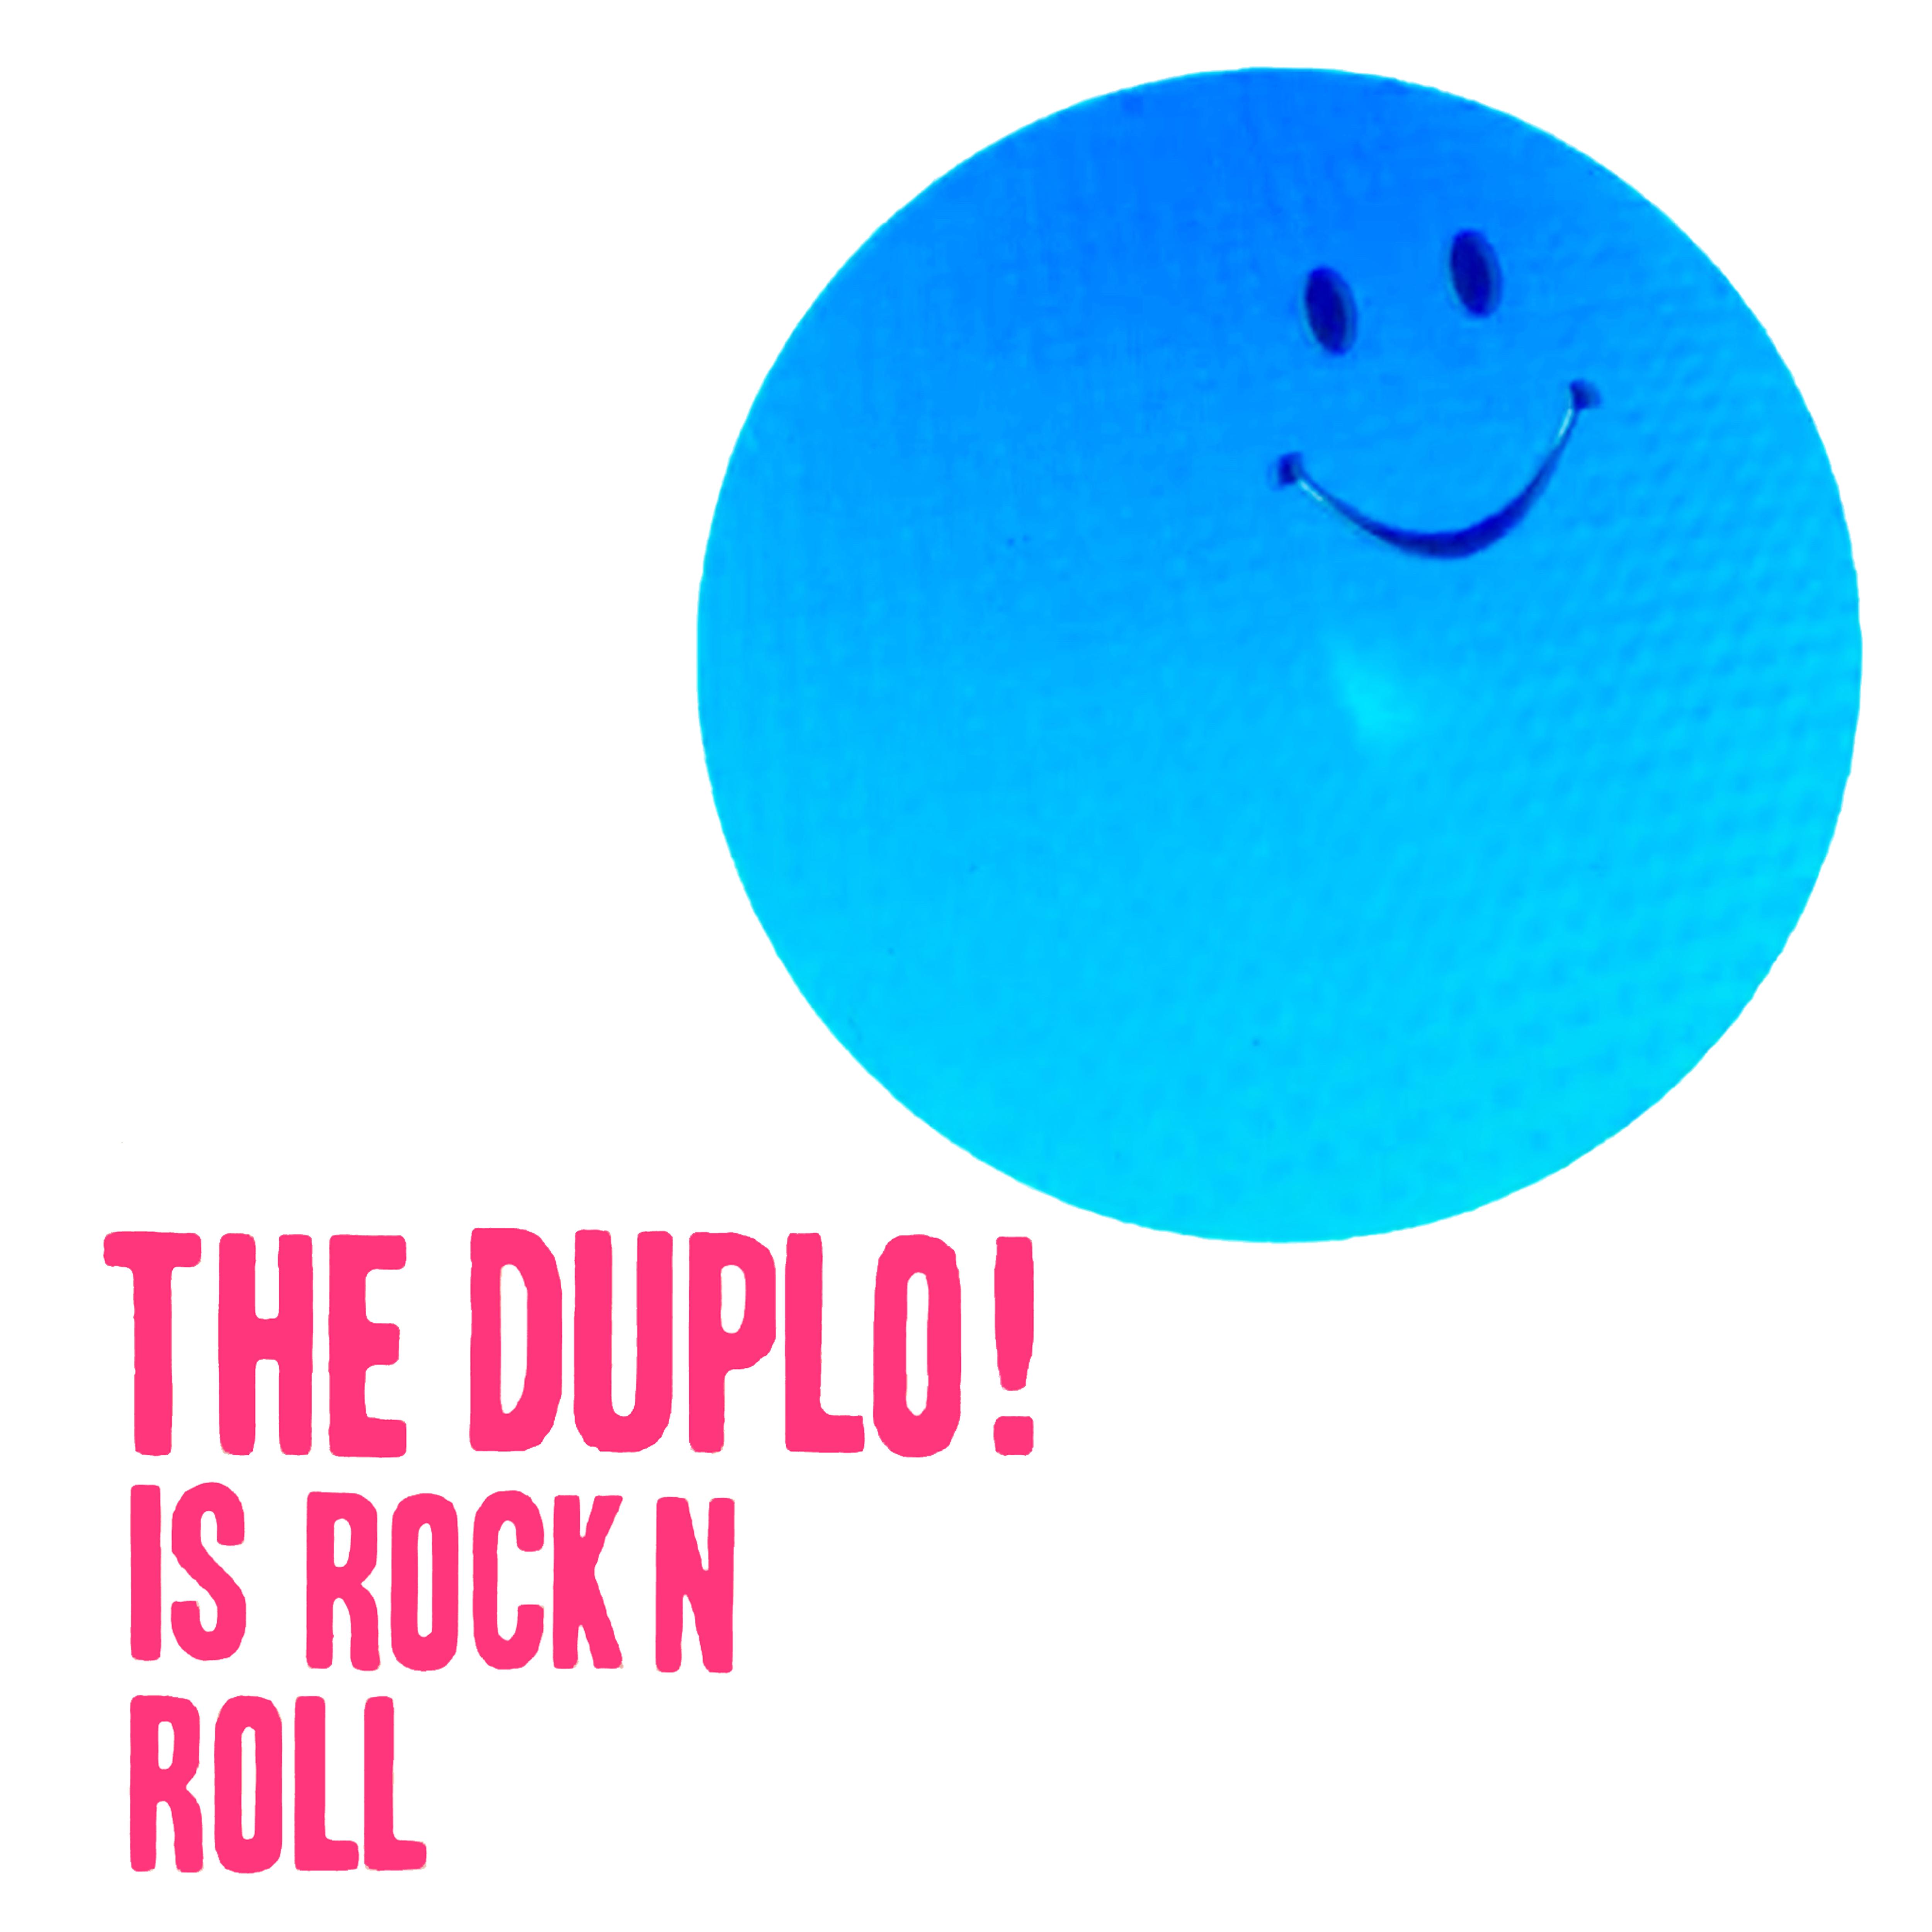 TheDuplo!_IsRockNRoll_Cover